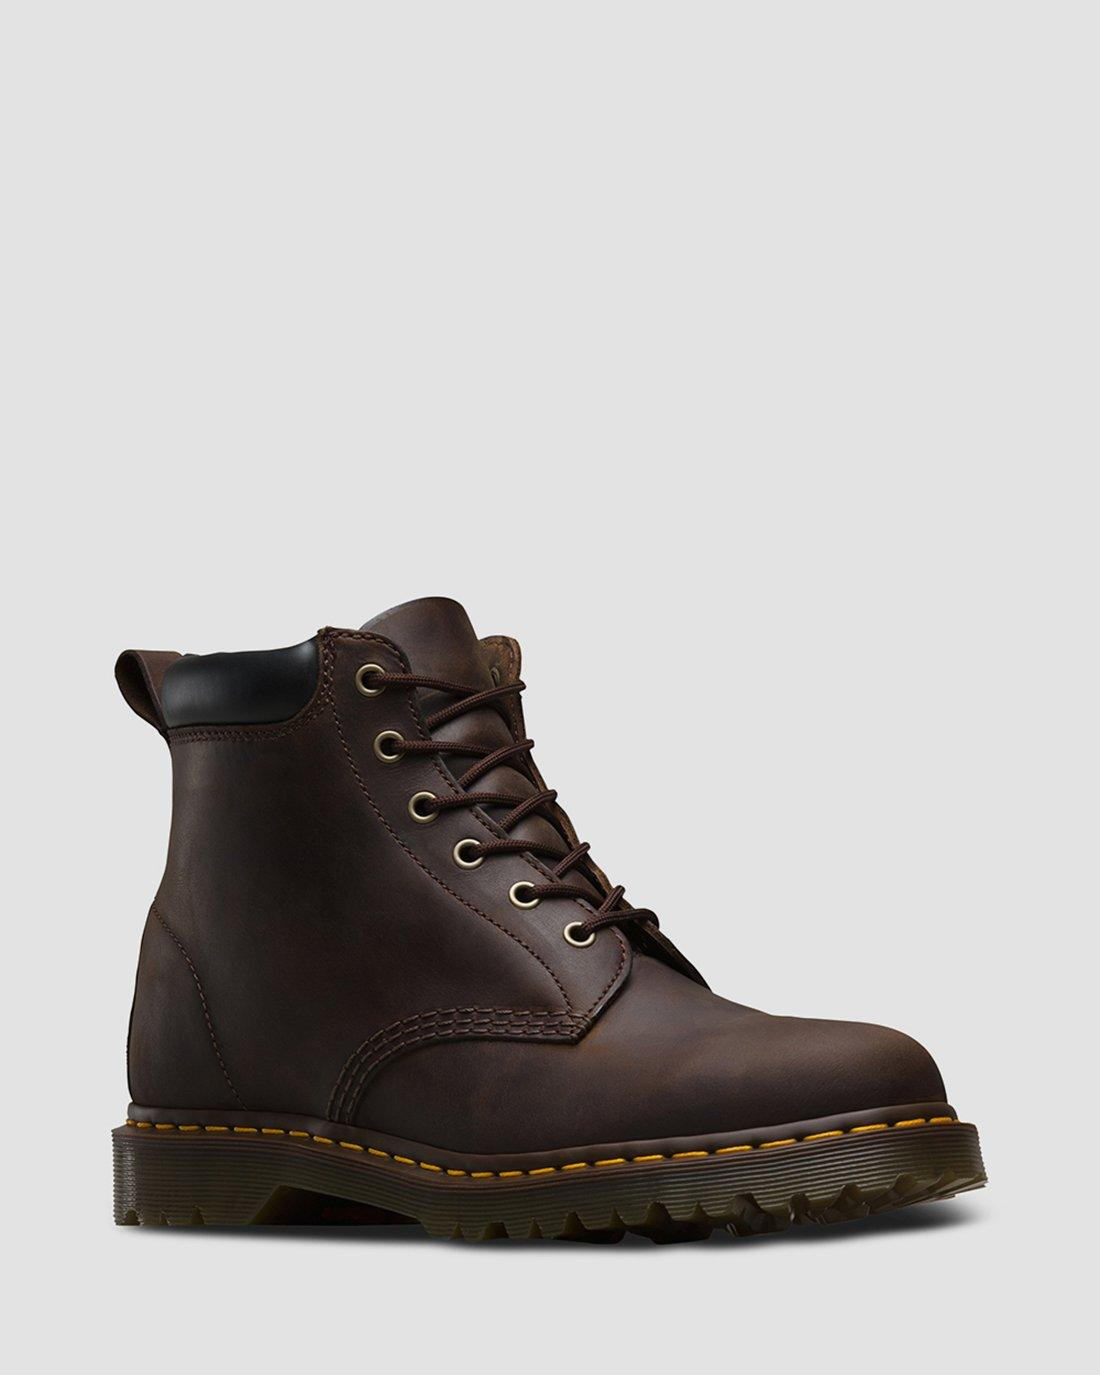 Dr. Martens 1460 Gaucho Crazy Horse Boot